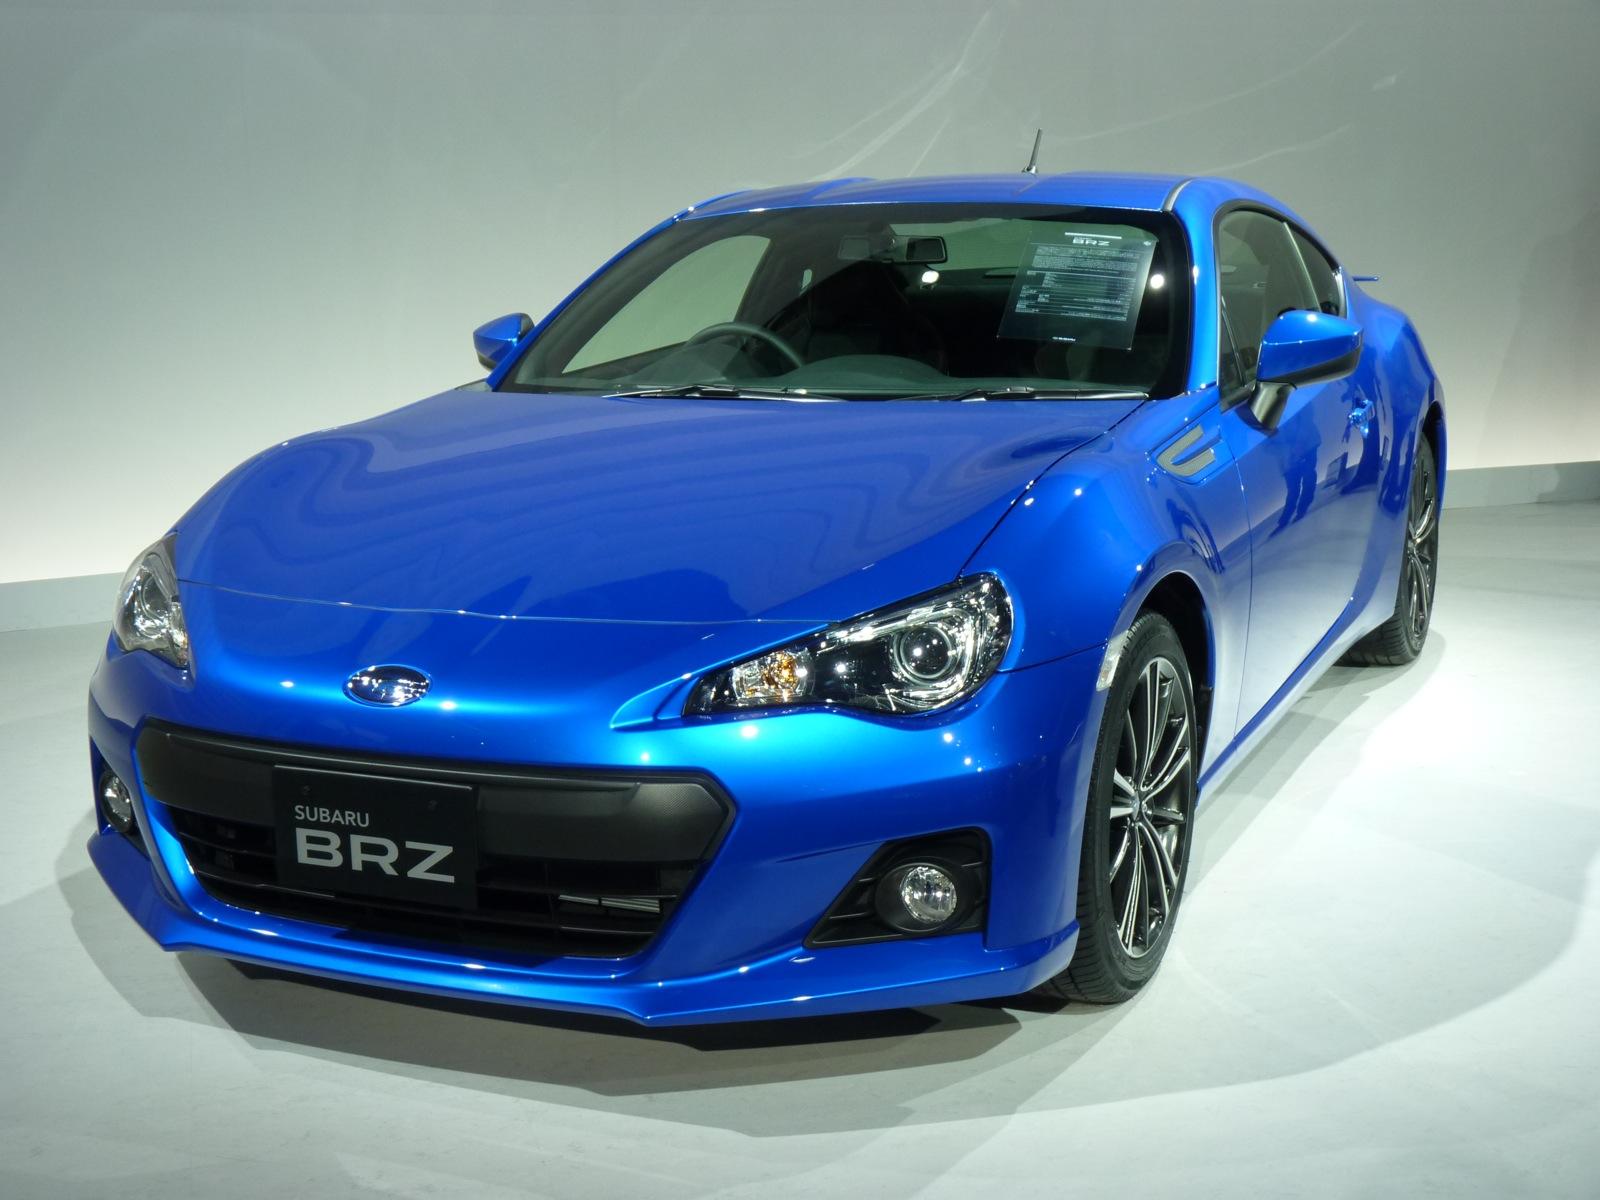 2013 Subaru BRZ, Scion FR-S Get EPA Fuel Economy Ratings